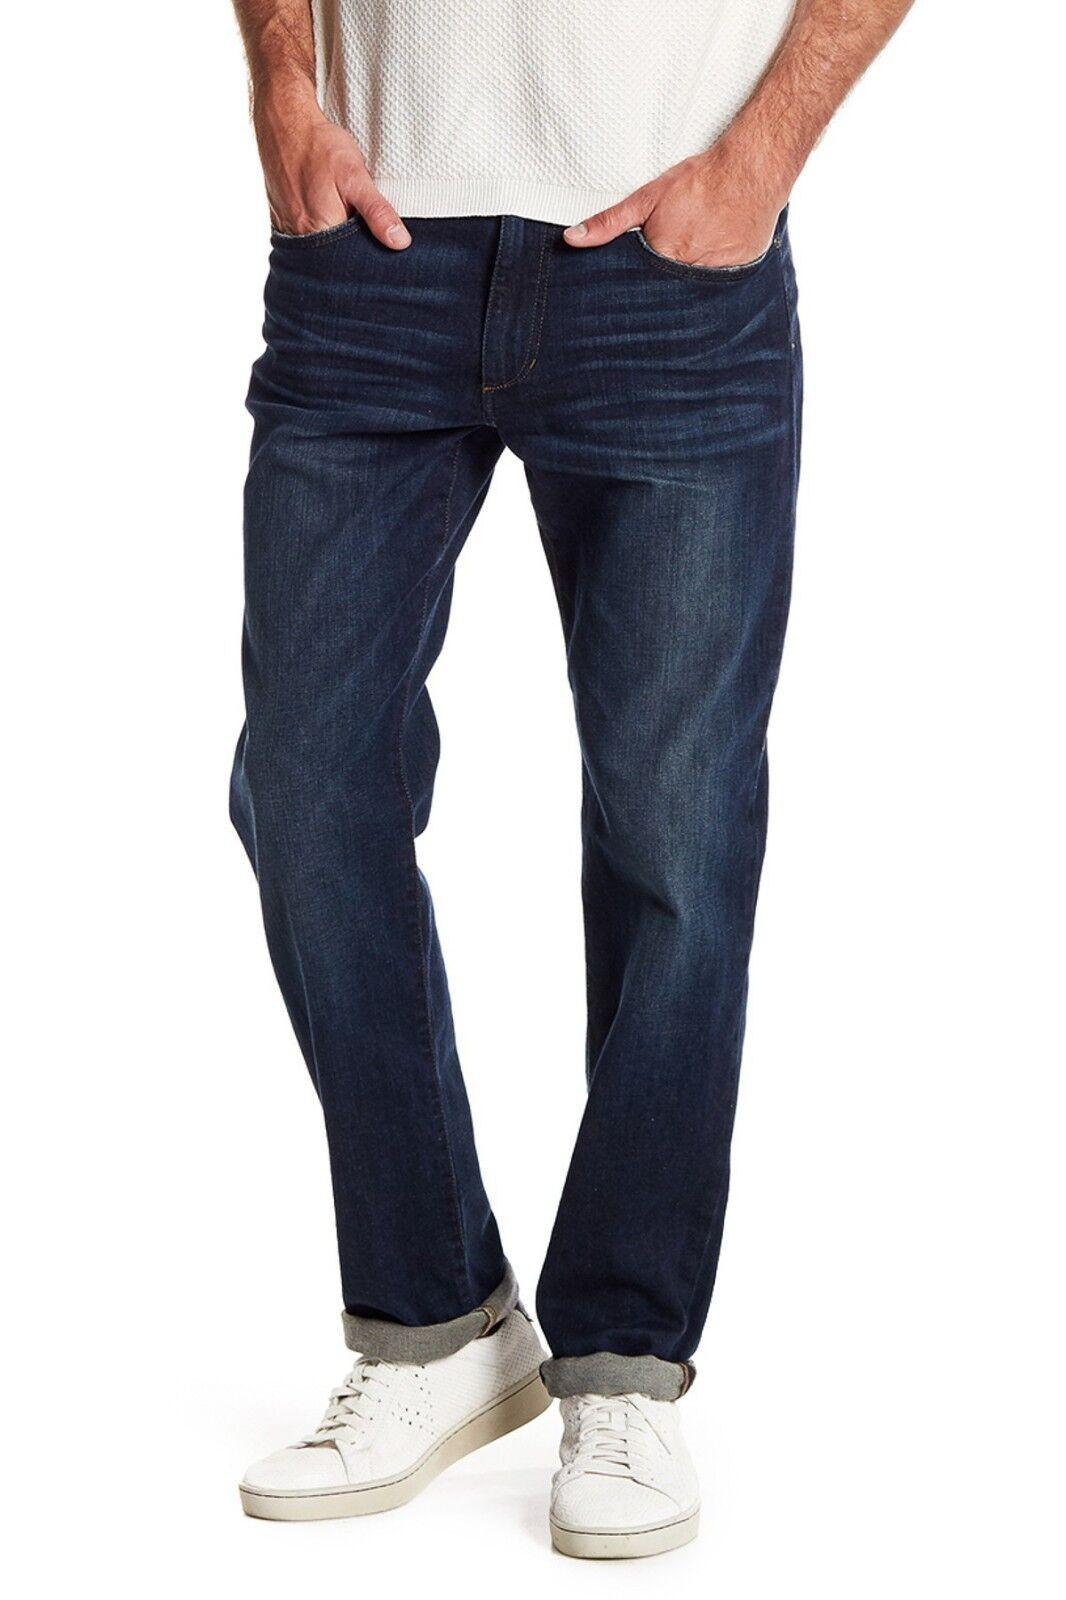 Joe's Jeans Brixton Straight and Narrow Jeans Denim Pants Seth 29 30 33 38 40